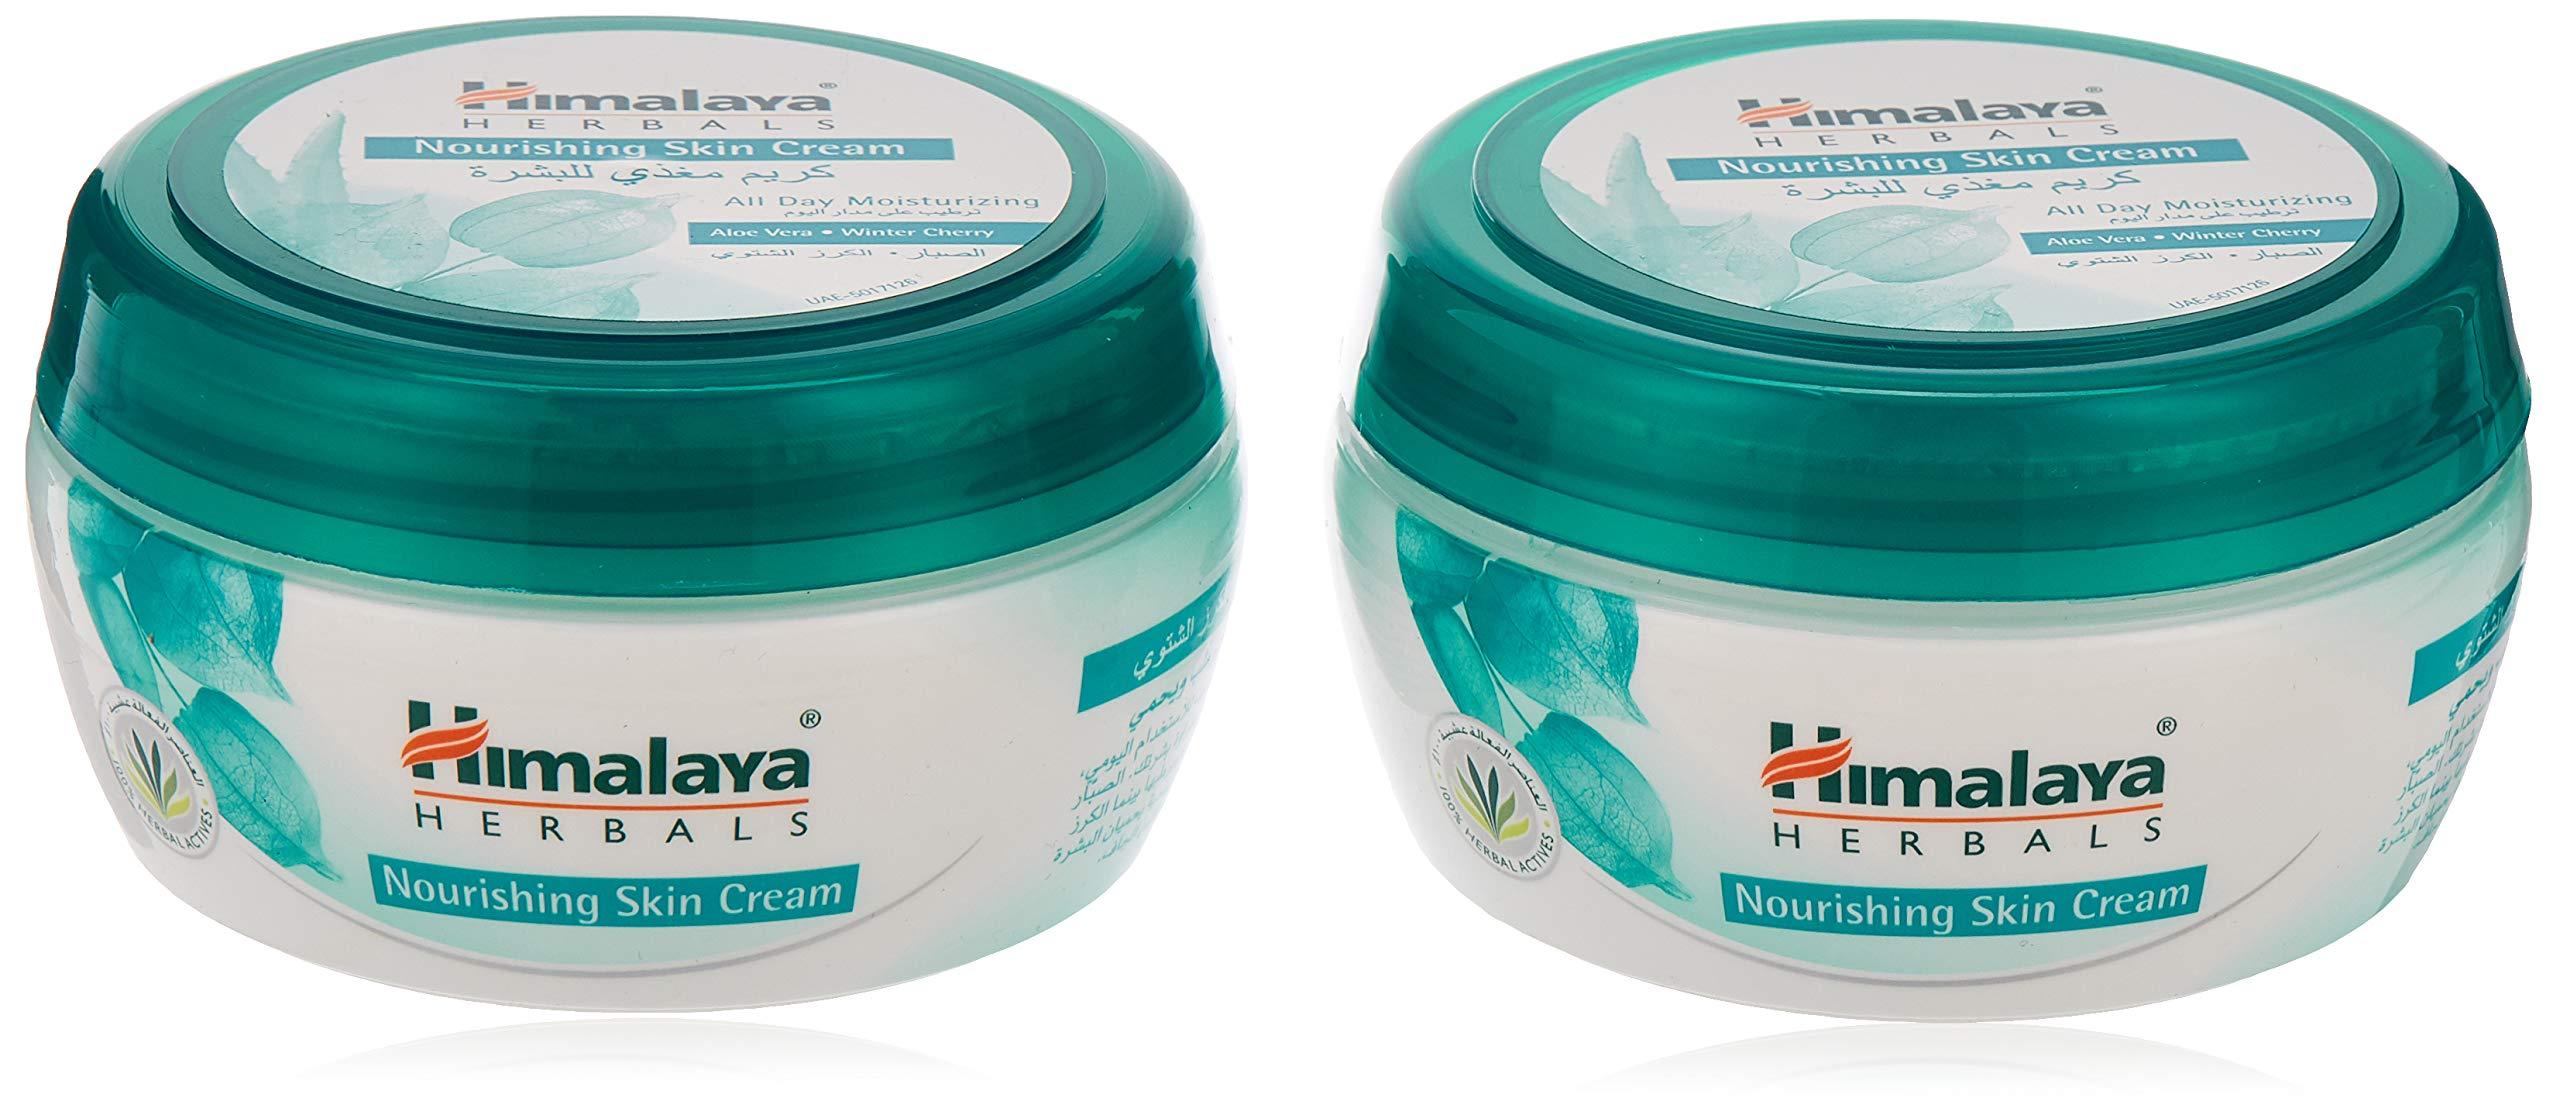 Himalaya Nourishing Skin Cream, 150 ml + 150 ml Free